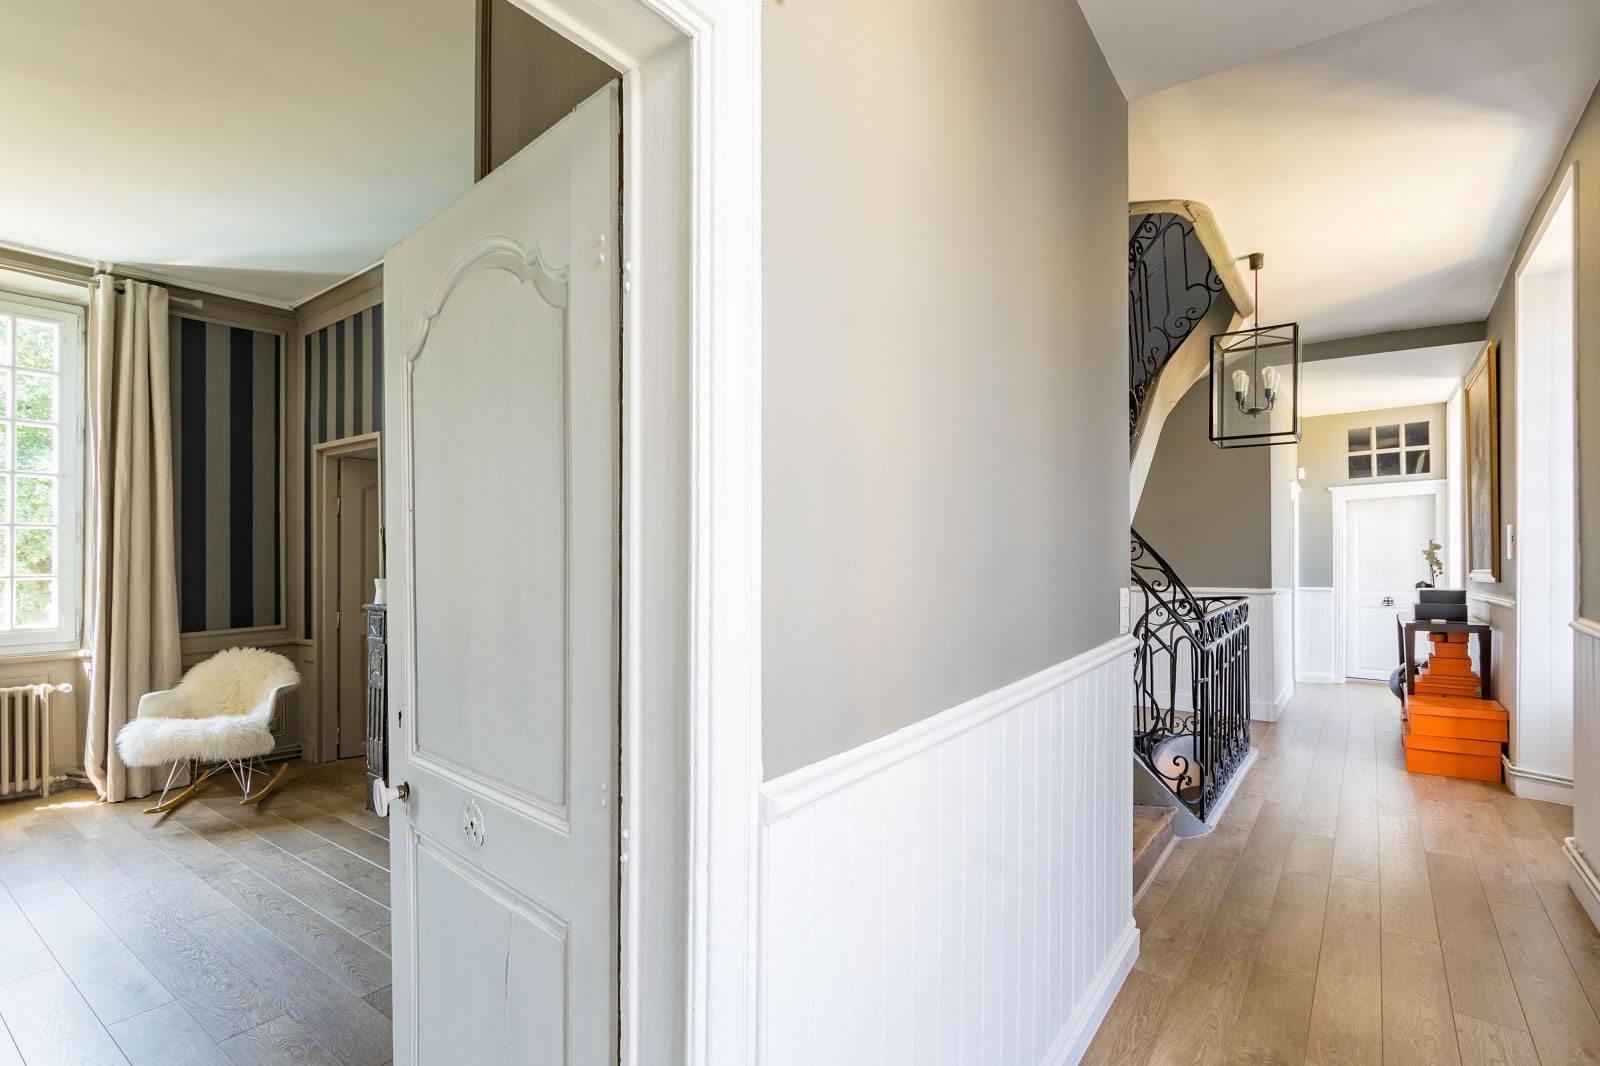 Recherche Un Appartement A Louer Pas Cher